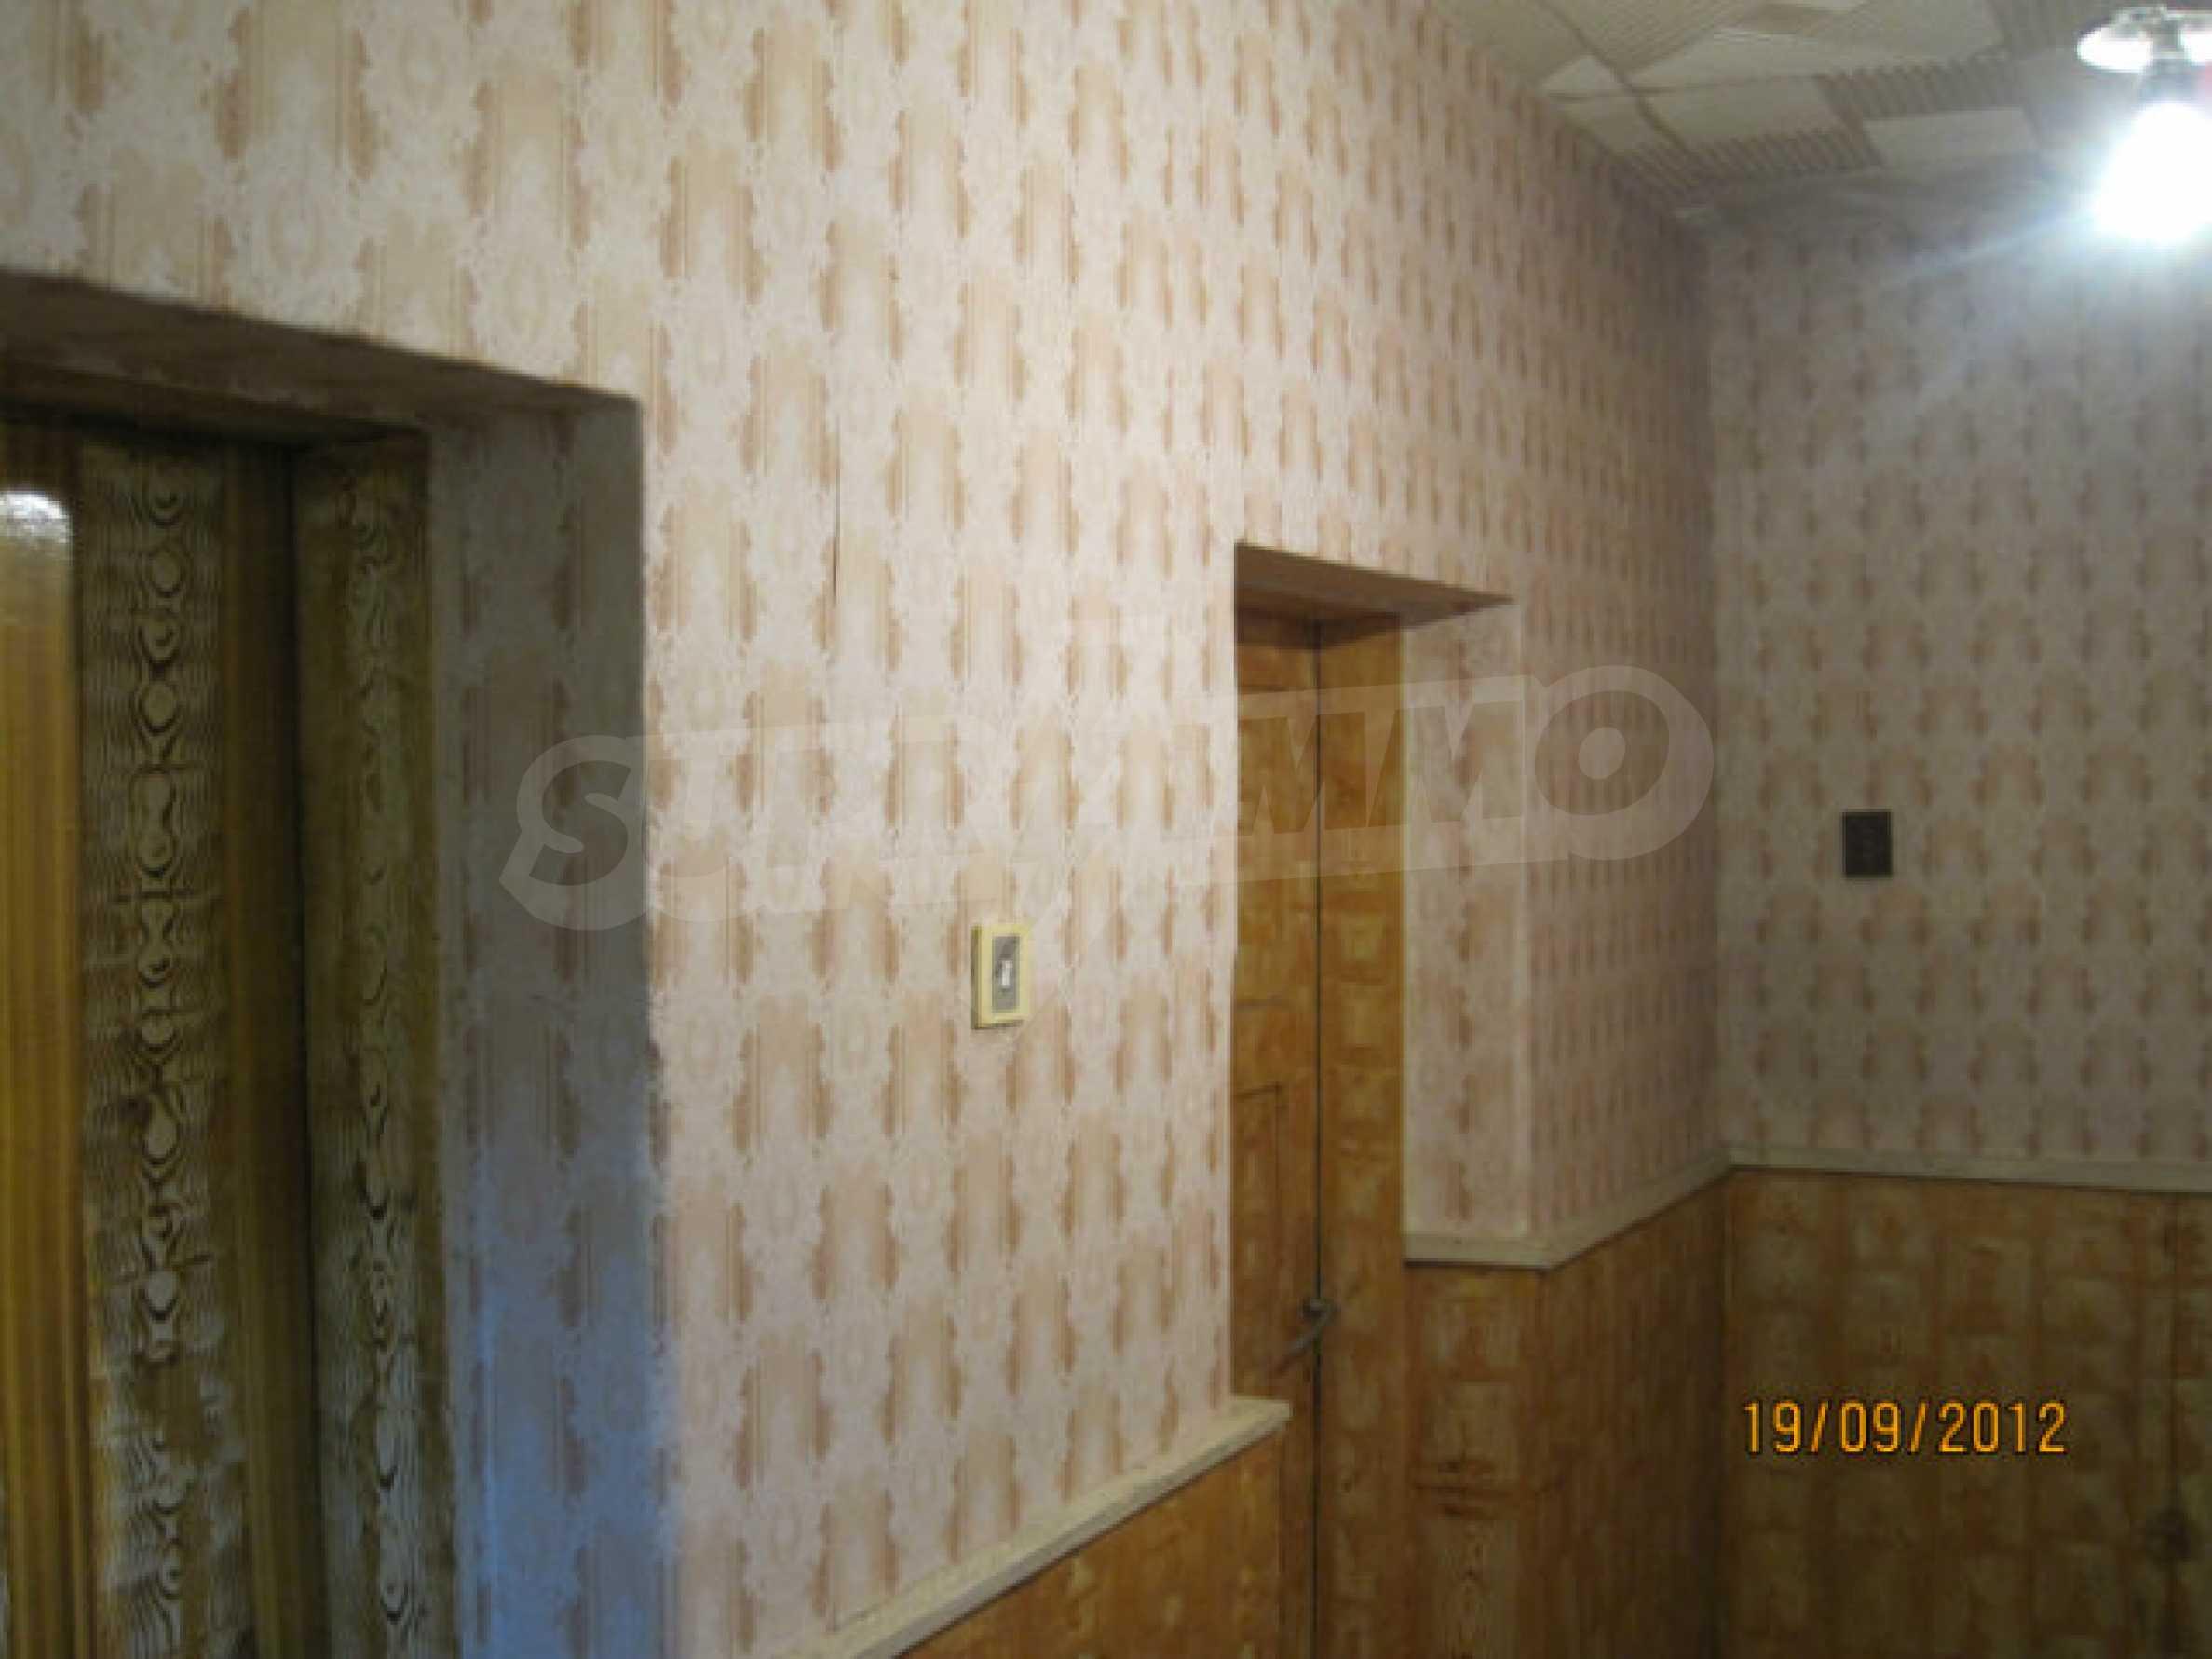 Detached house for sale in a quiet village near Dimitrovgrad 5